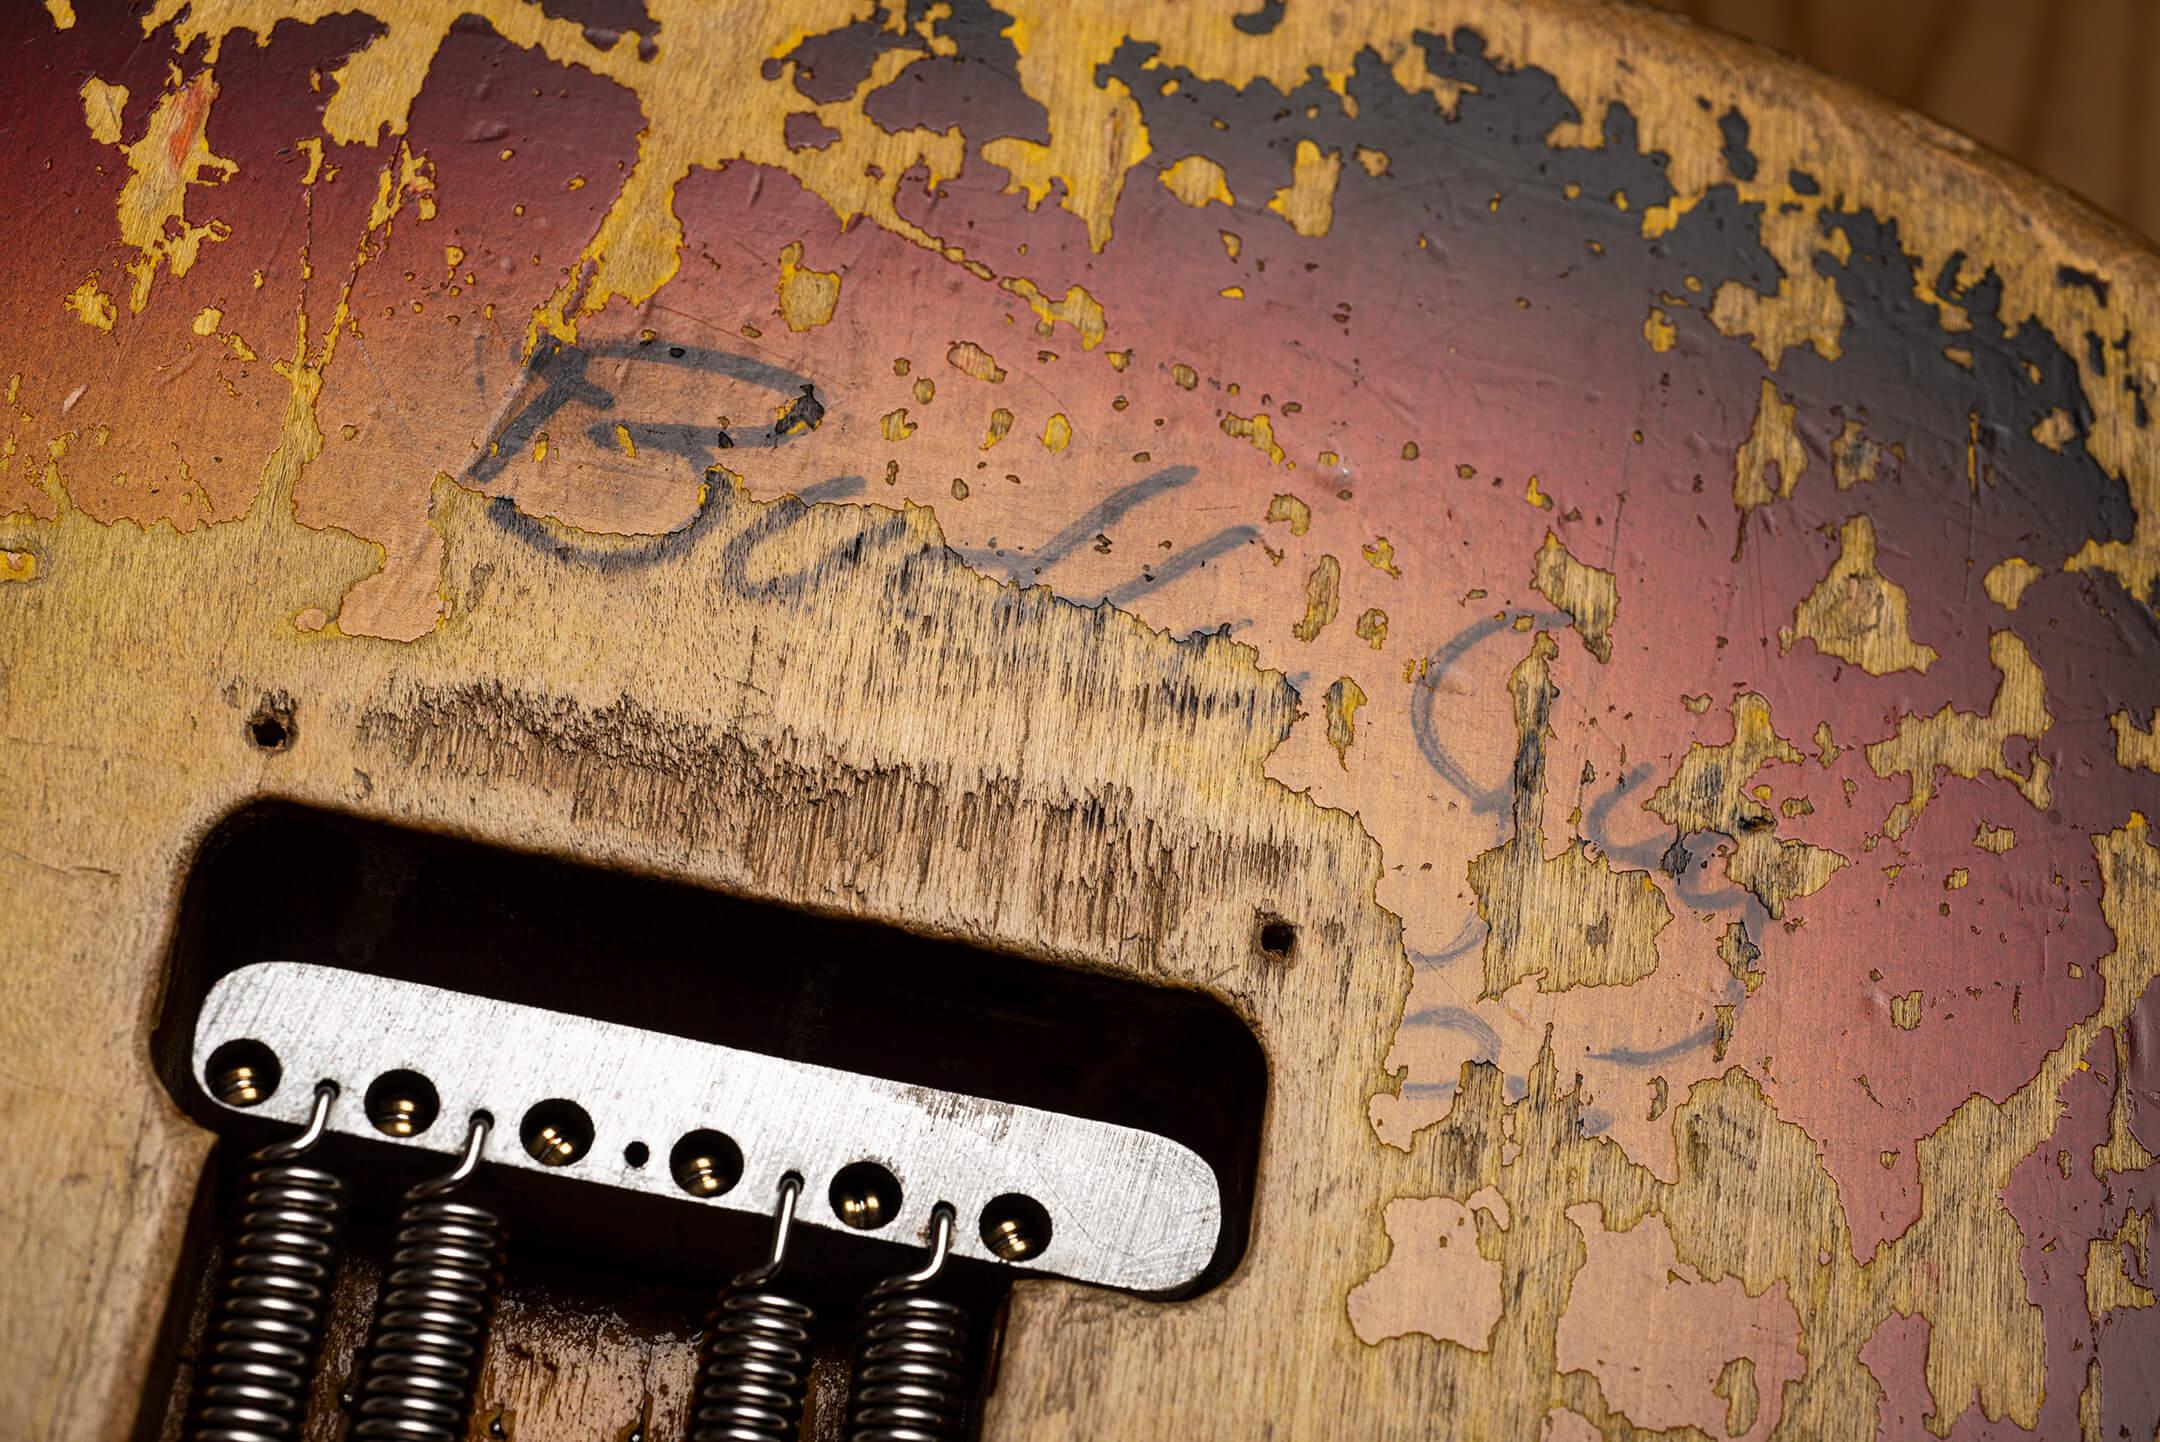 Scott McKeon's 1962 Stratocaster